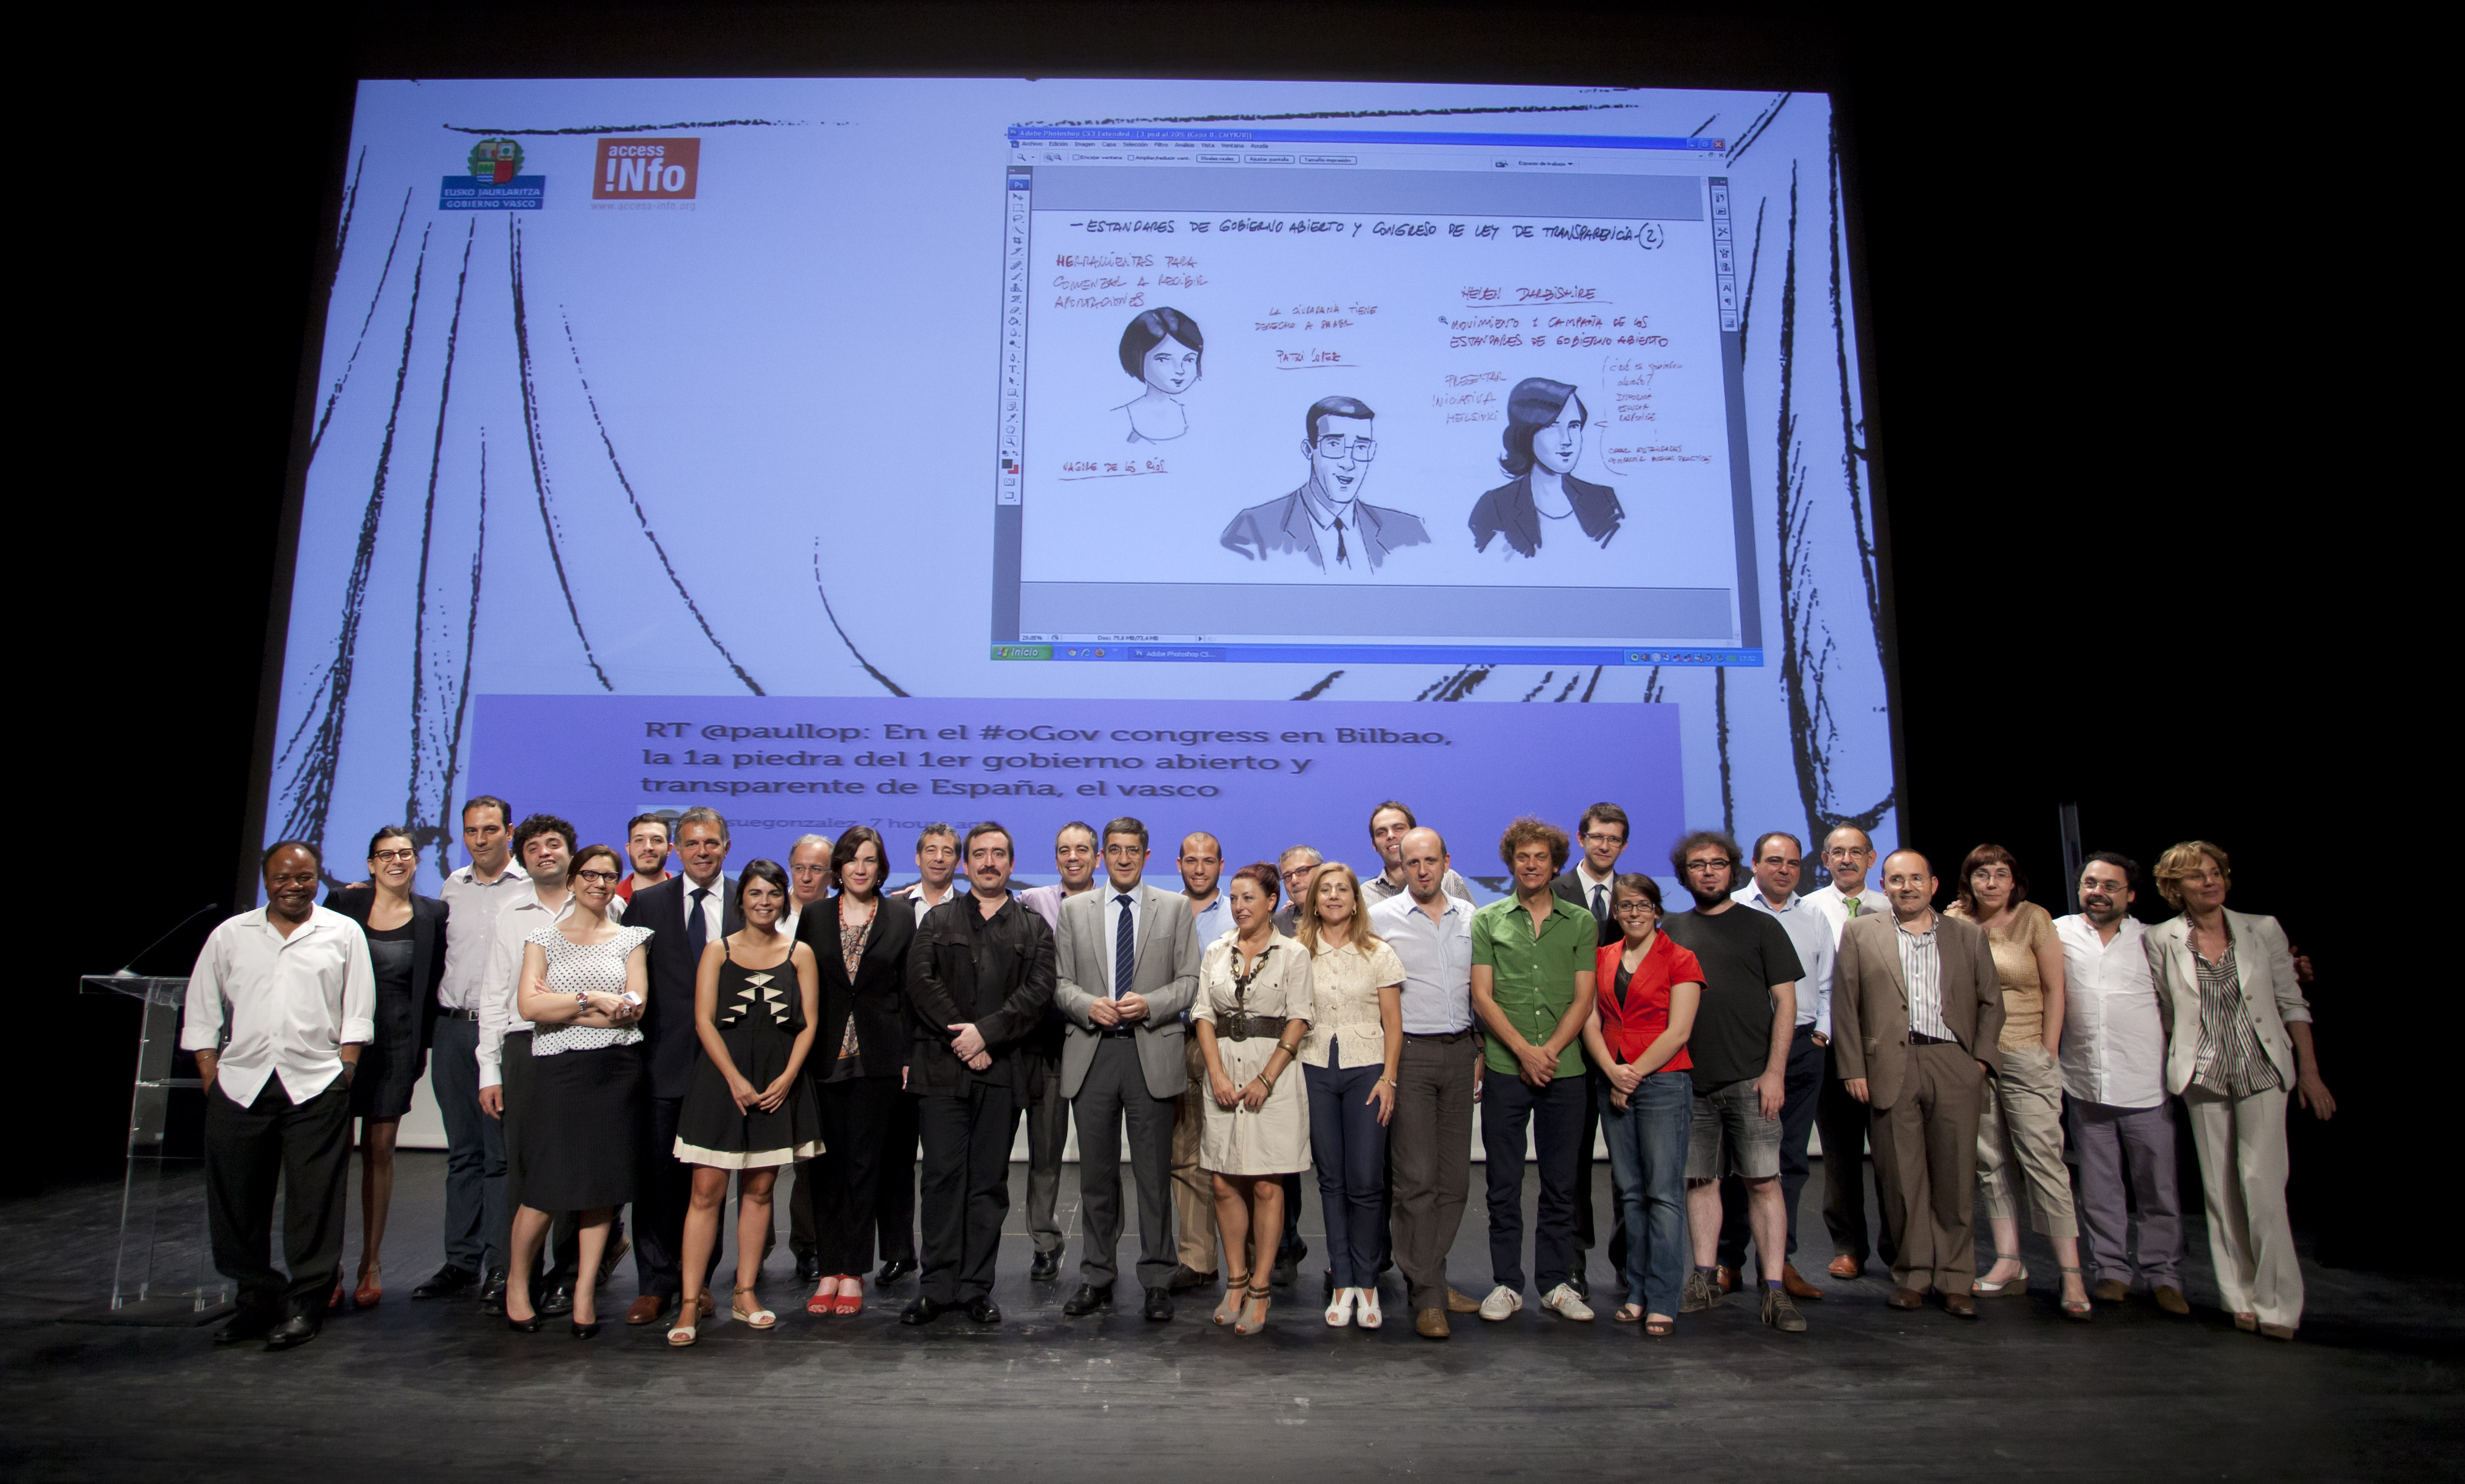 congreso_bilbao_ley_de_transparencia